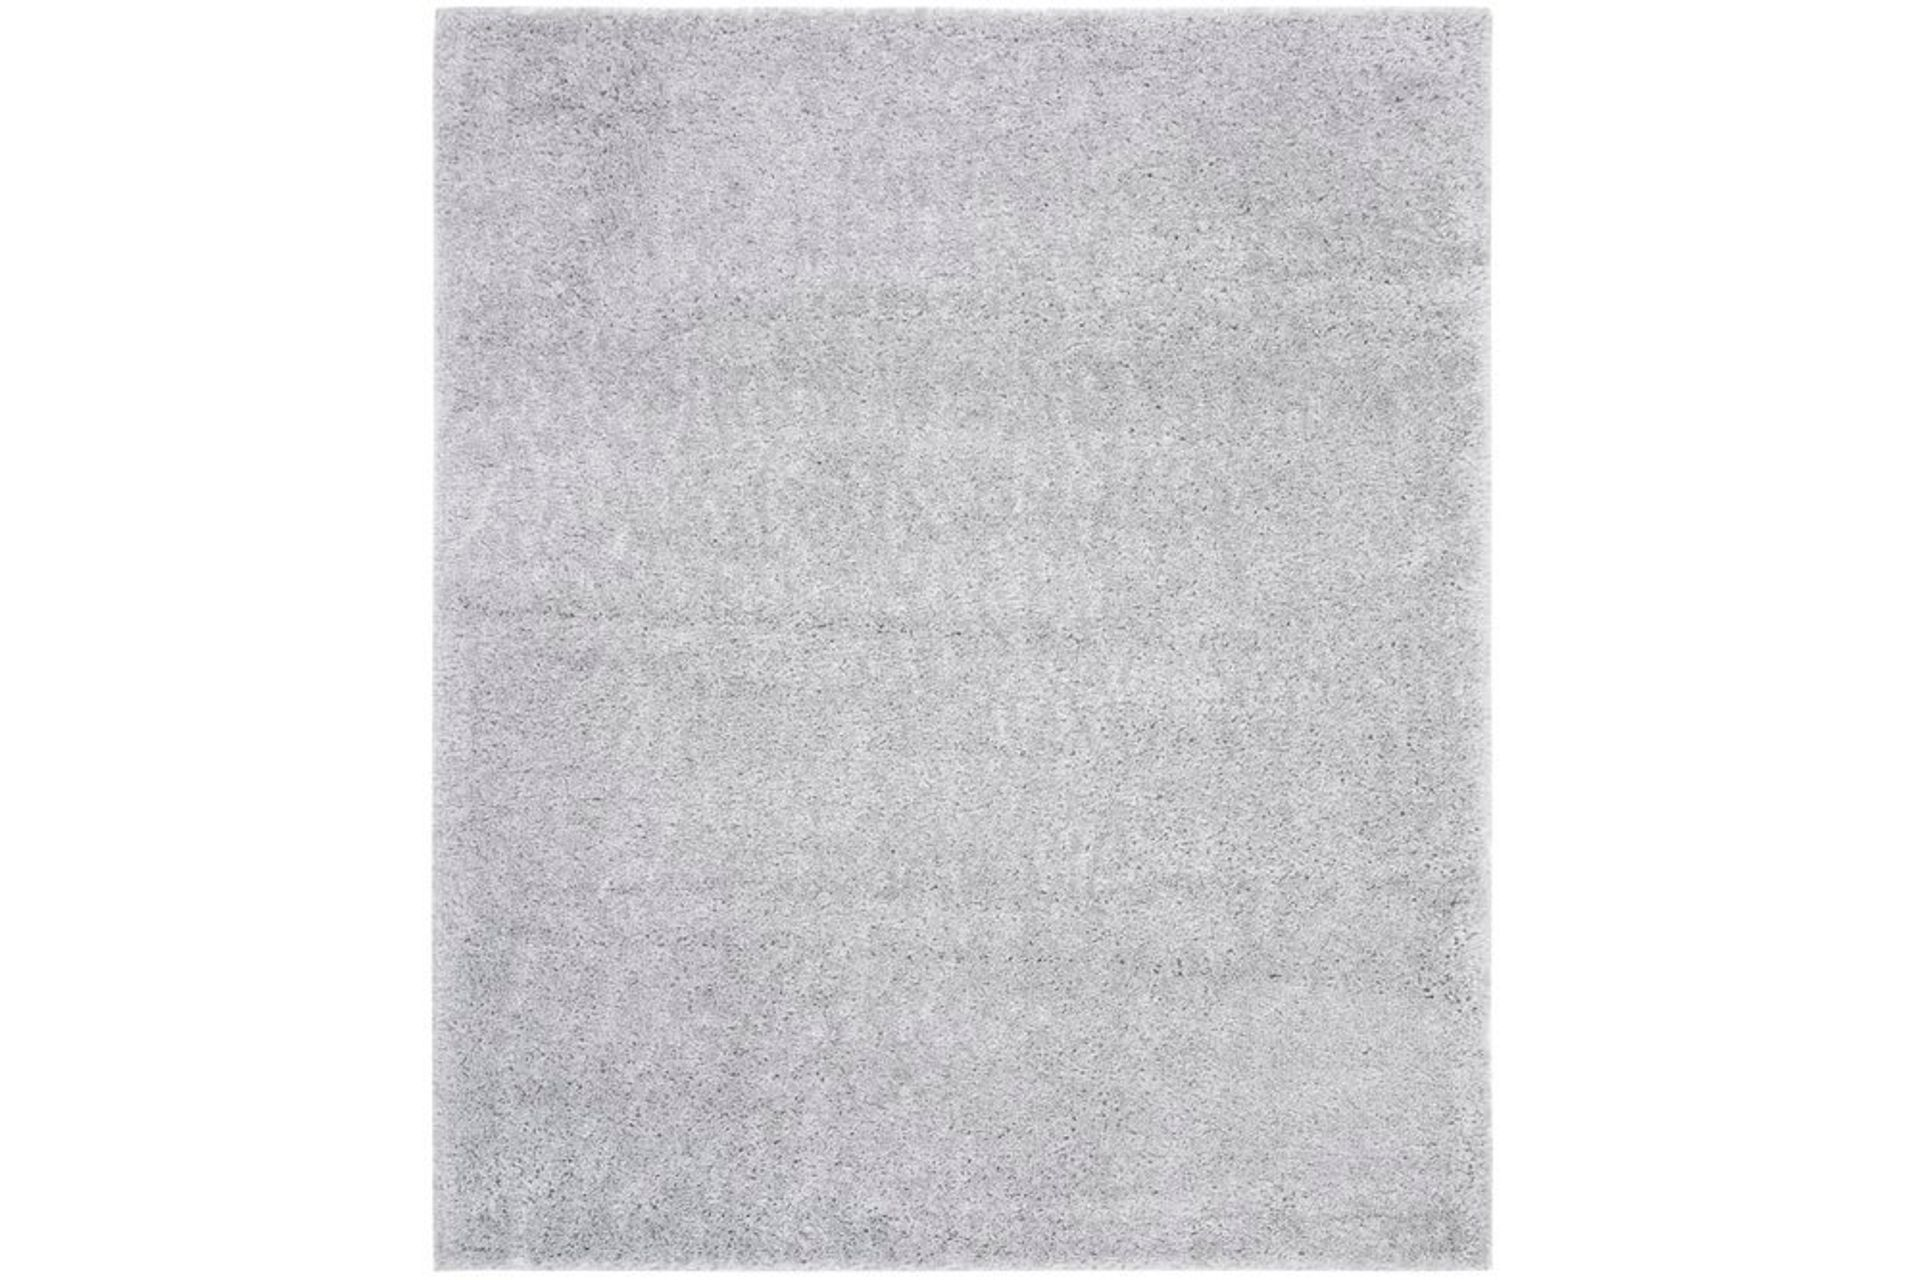 Ava Minimalist Woven Rug, 80 x 150, Grey